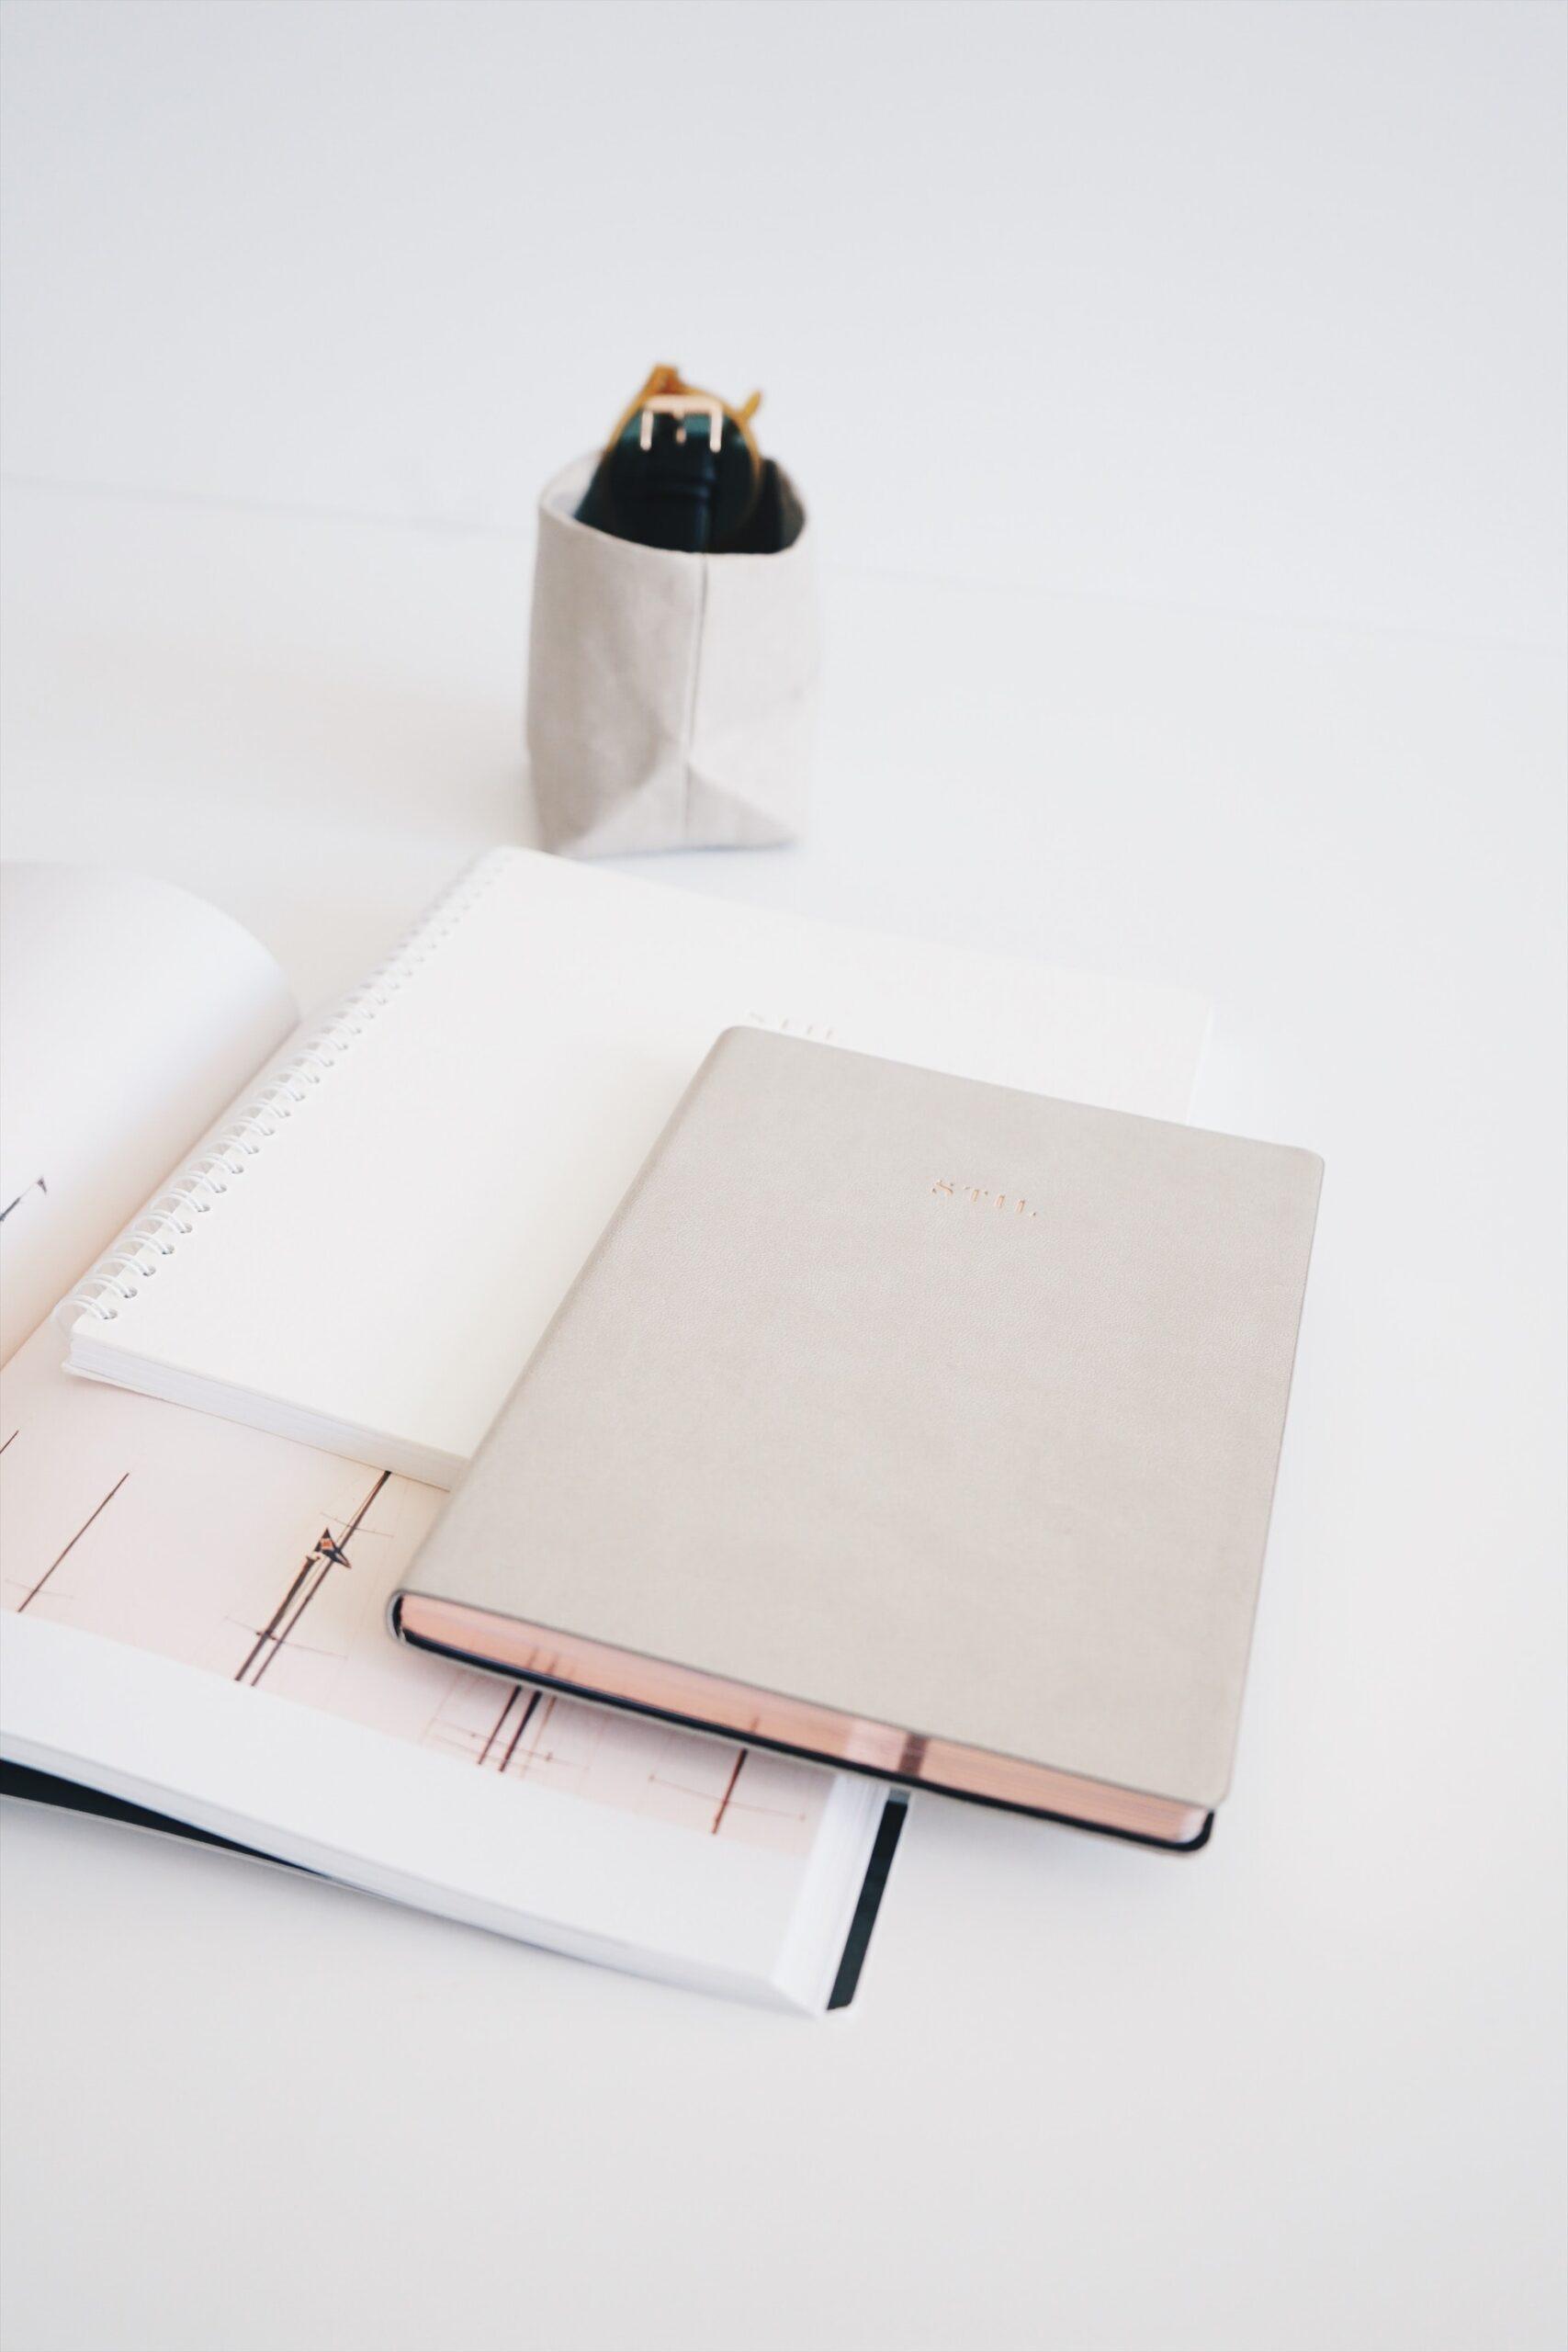 Calendar and planner on desk